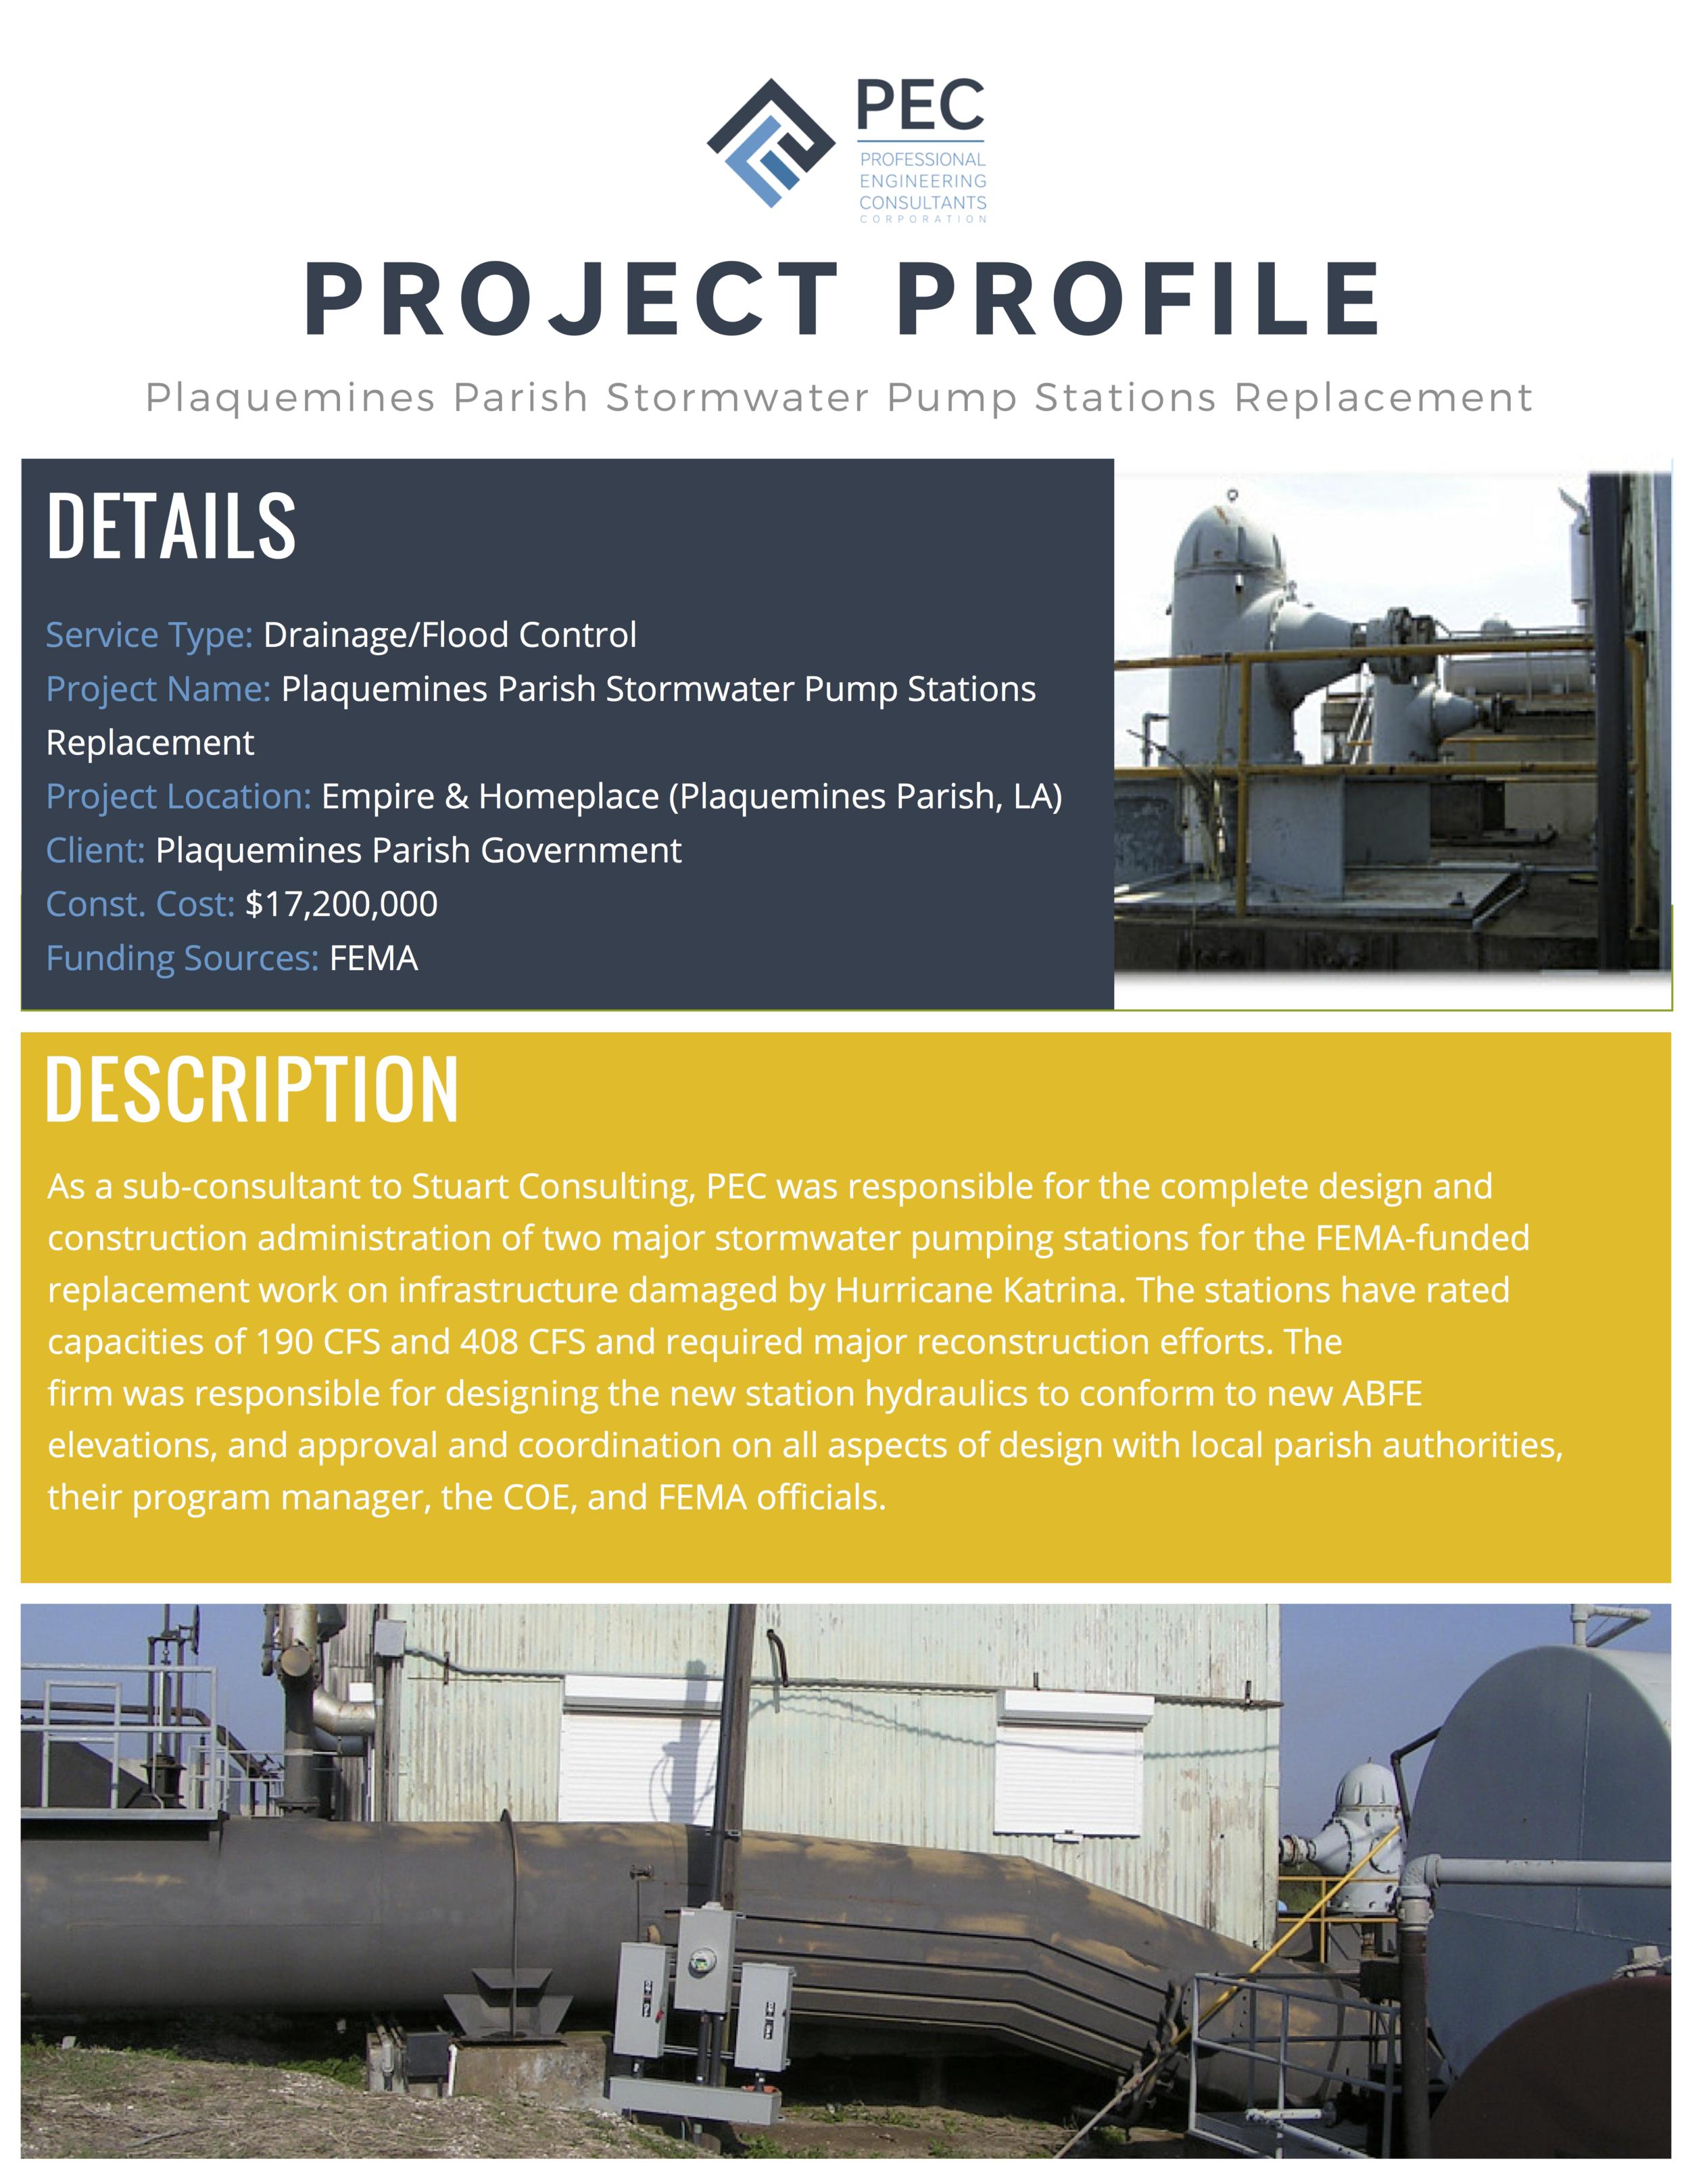 Project Profile_PlaqueminesParishFINAL.jpg